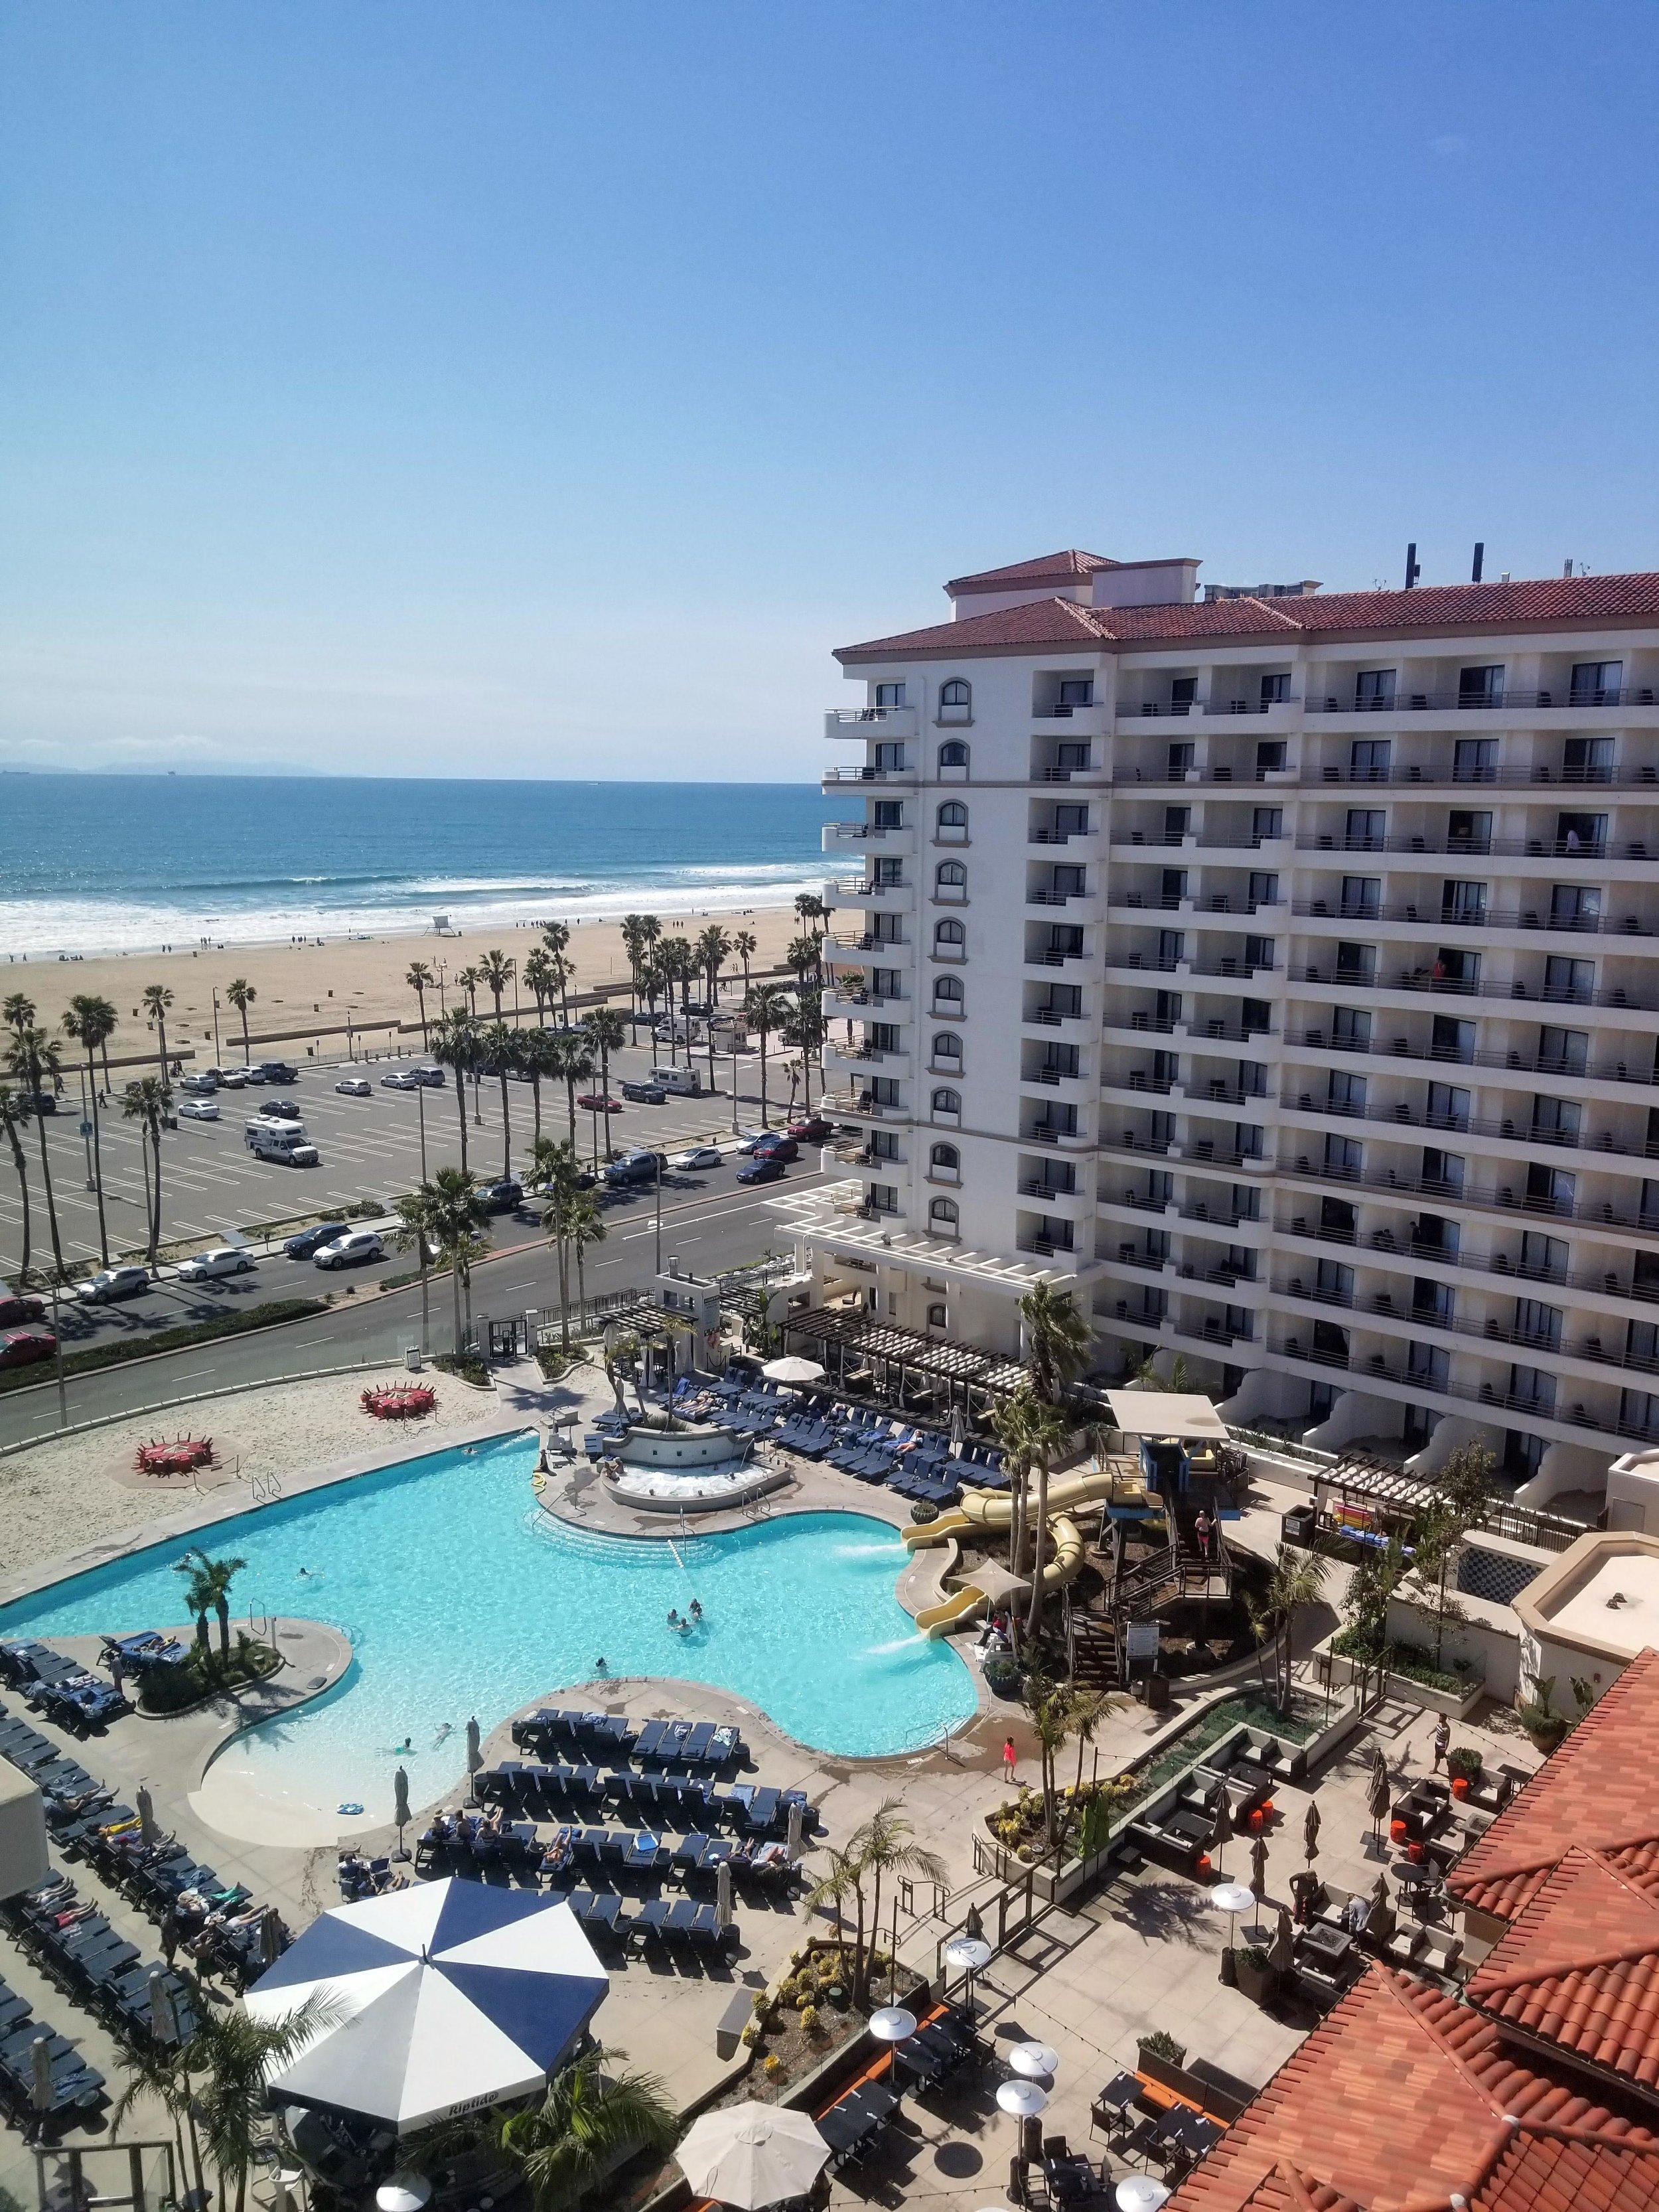 The Waterfront Beach Resort in Huntington Beach, California.